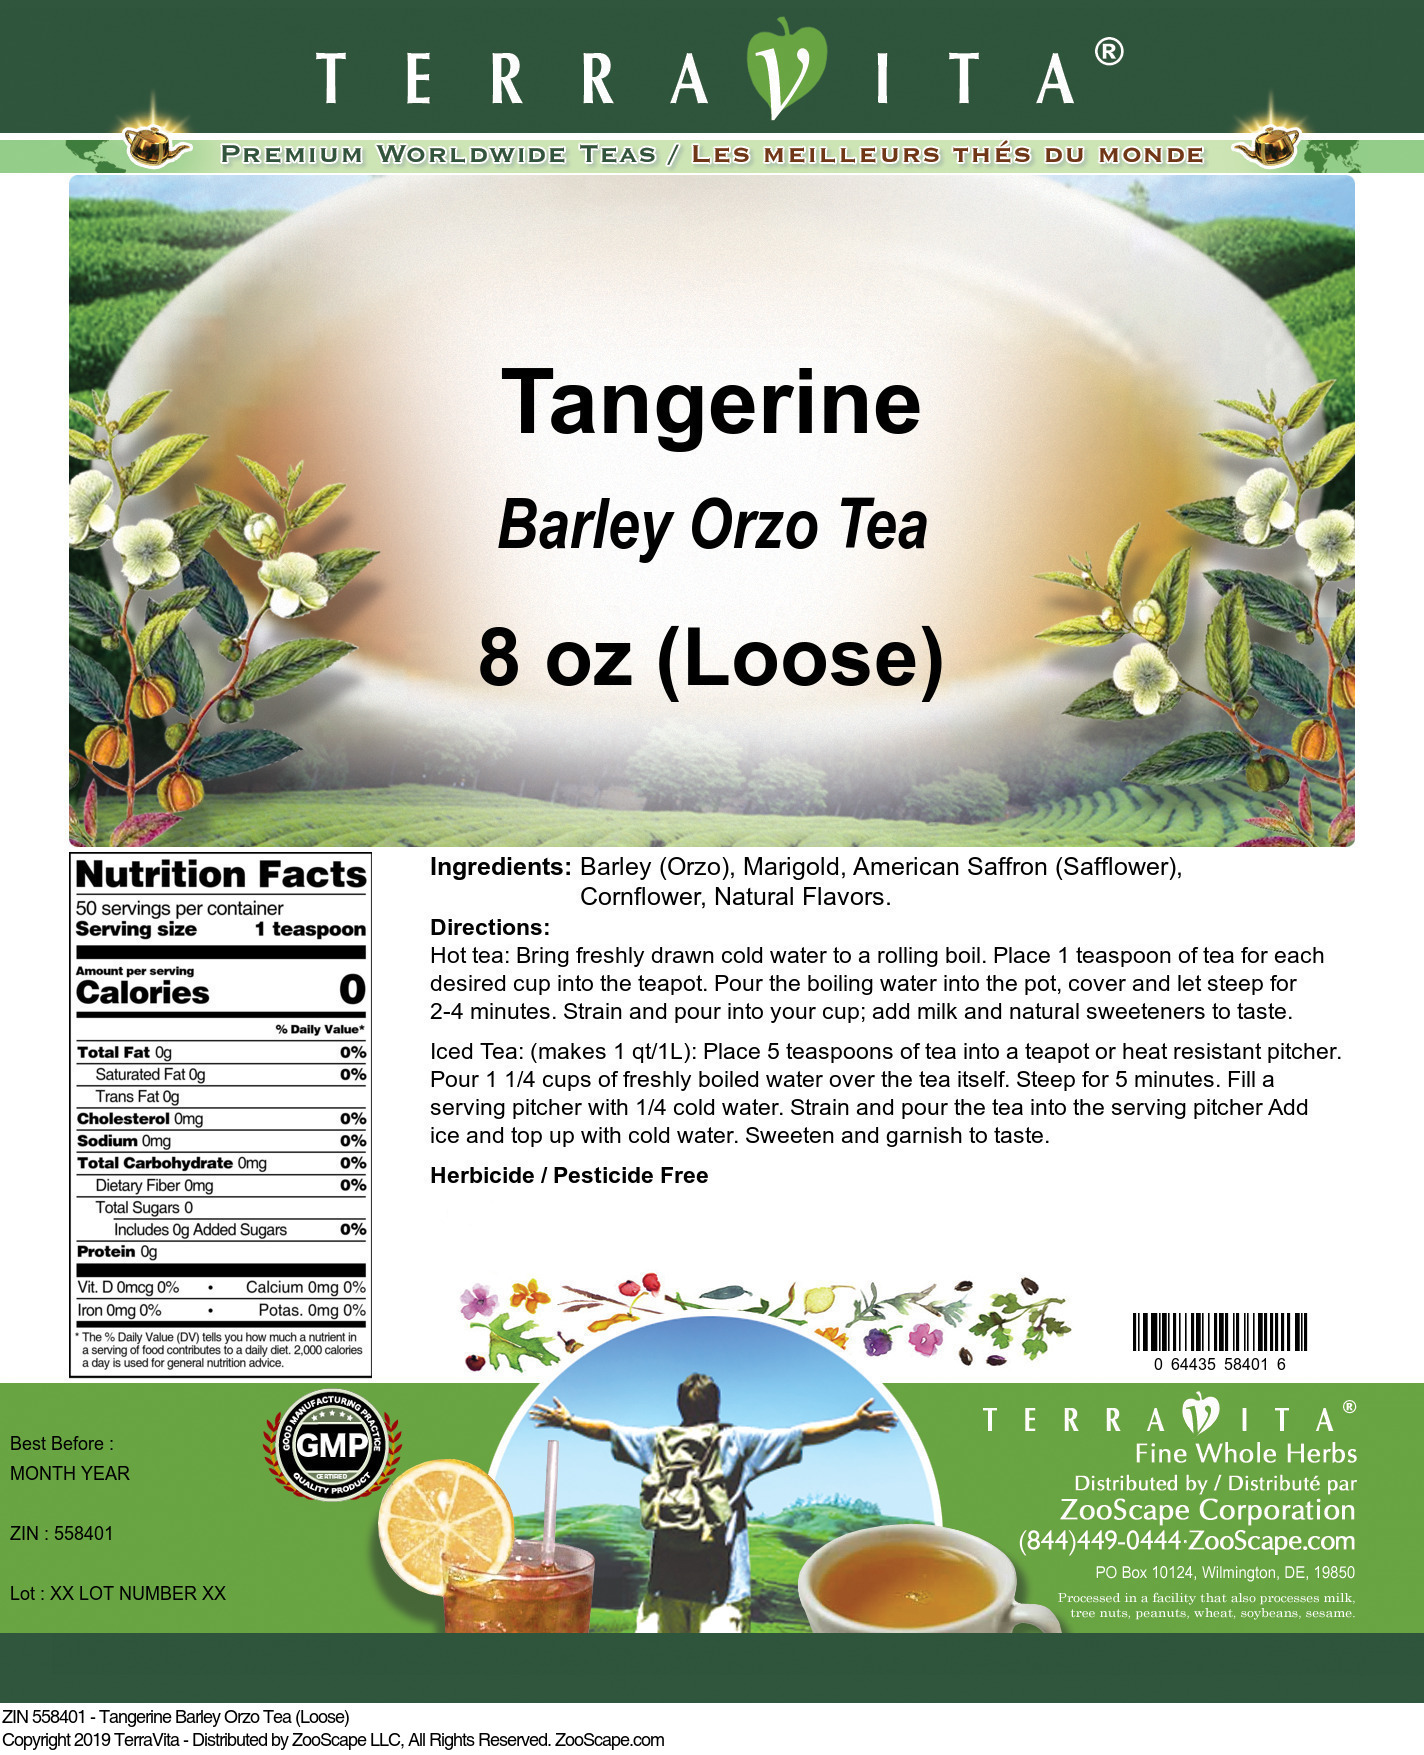 Tangerine Barley Orzo Tea (Loose)